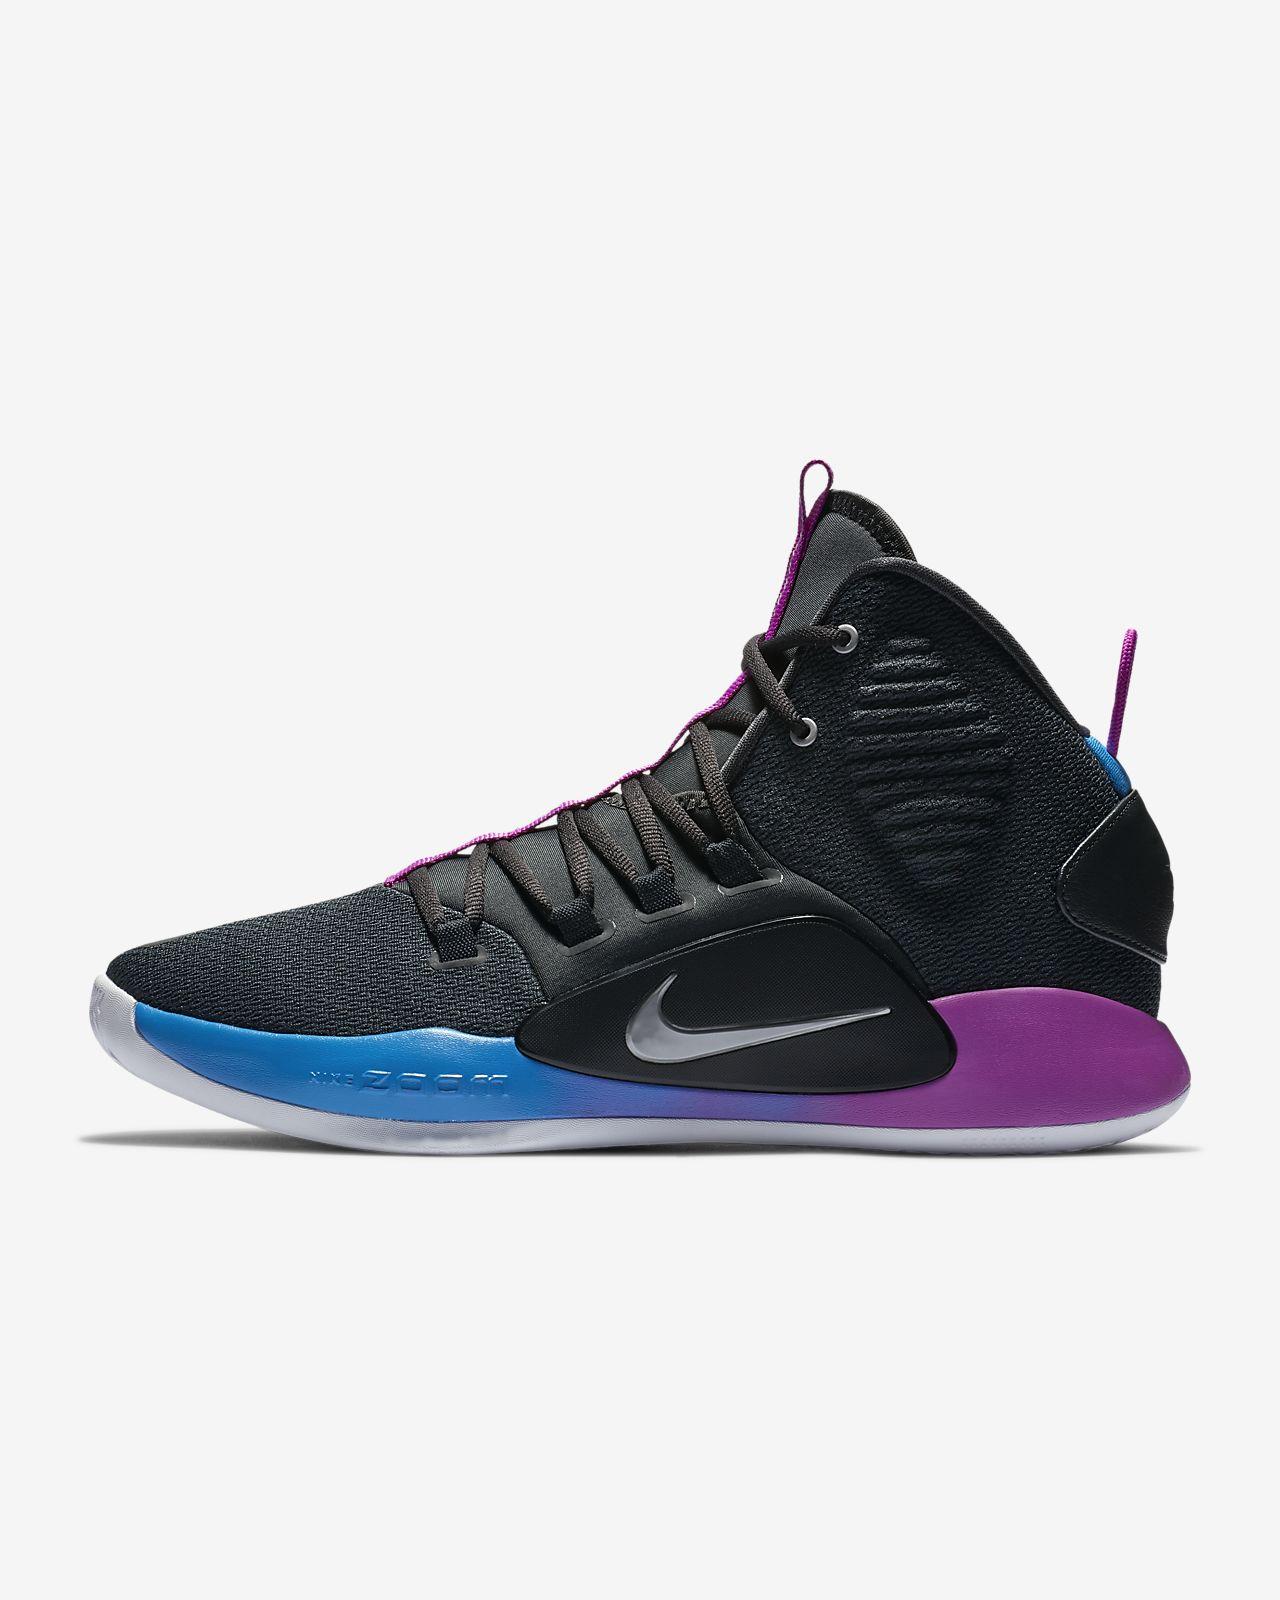 Nike Hyperdunk X Basketballschuh